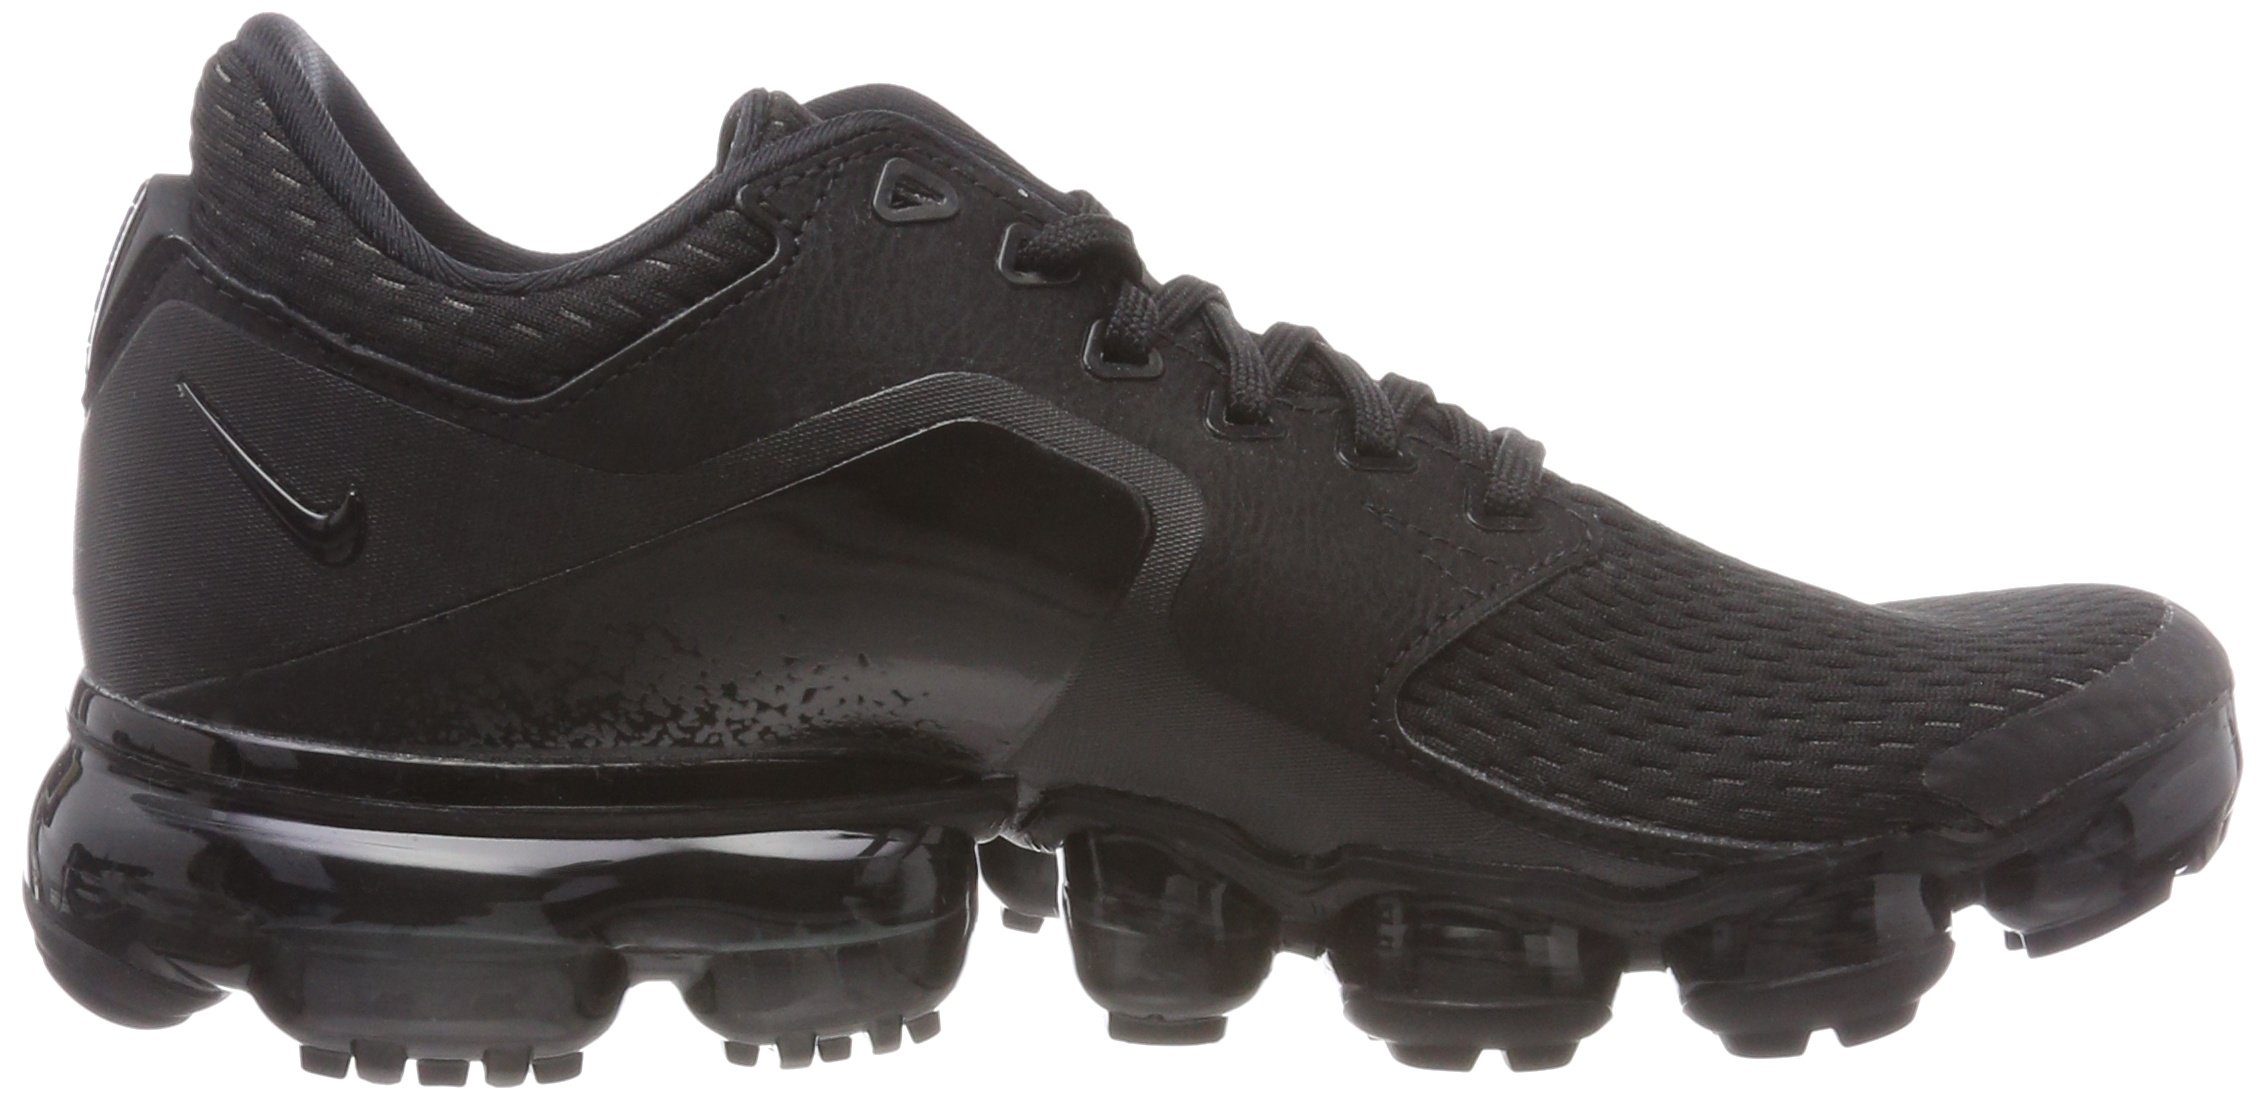 NIKE Kids' Grade School Air Vapormax Running Shoes (Black/Black/Black,5) by NIKE (Image #6)